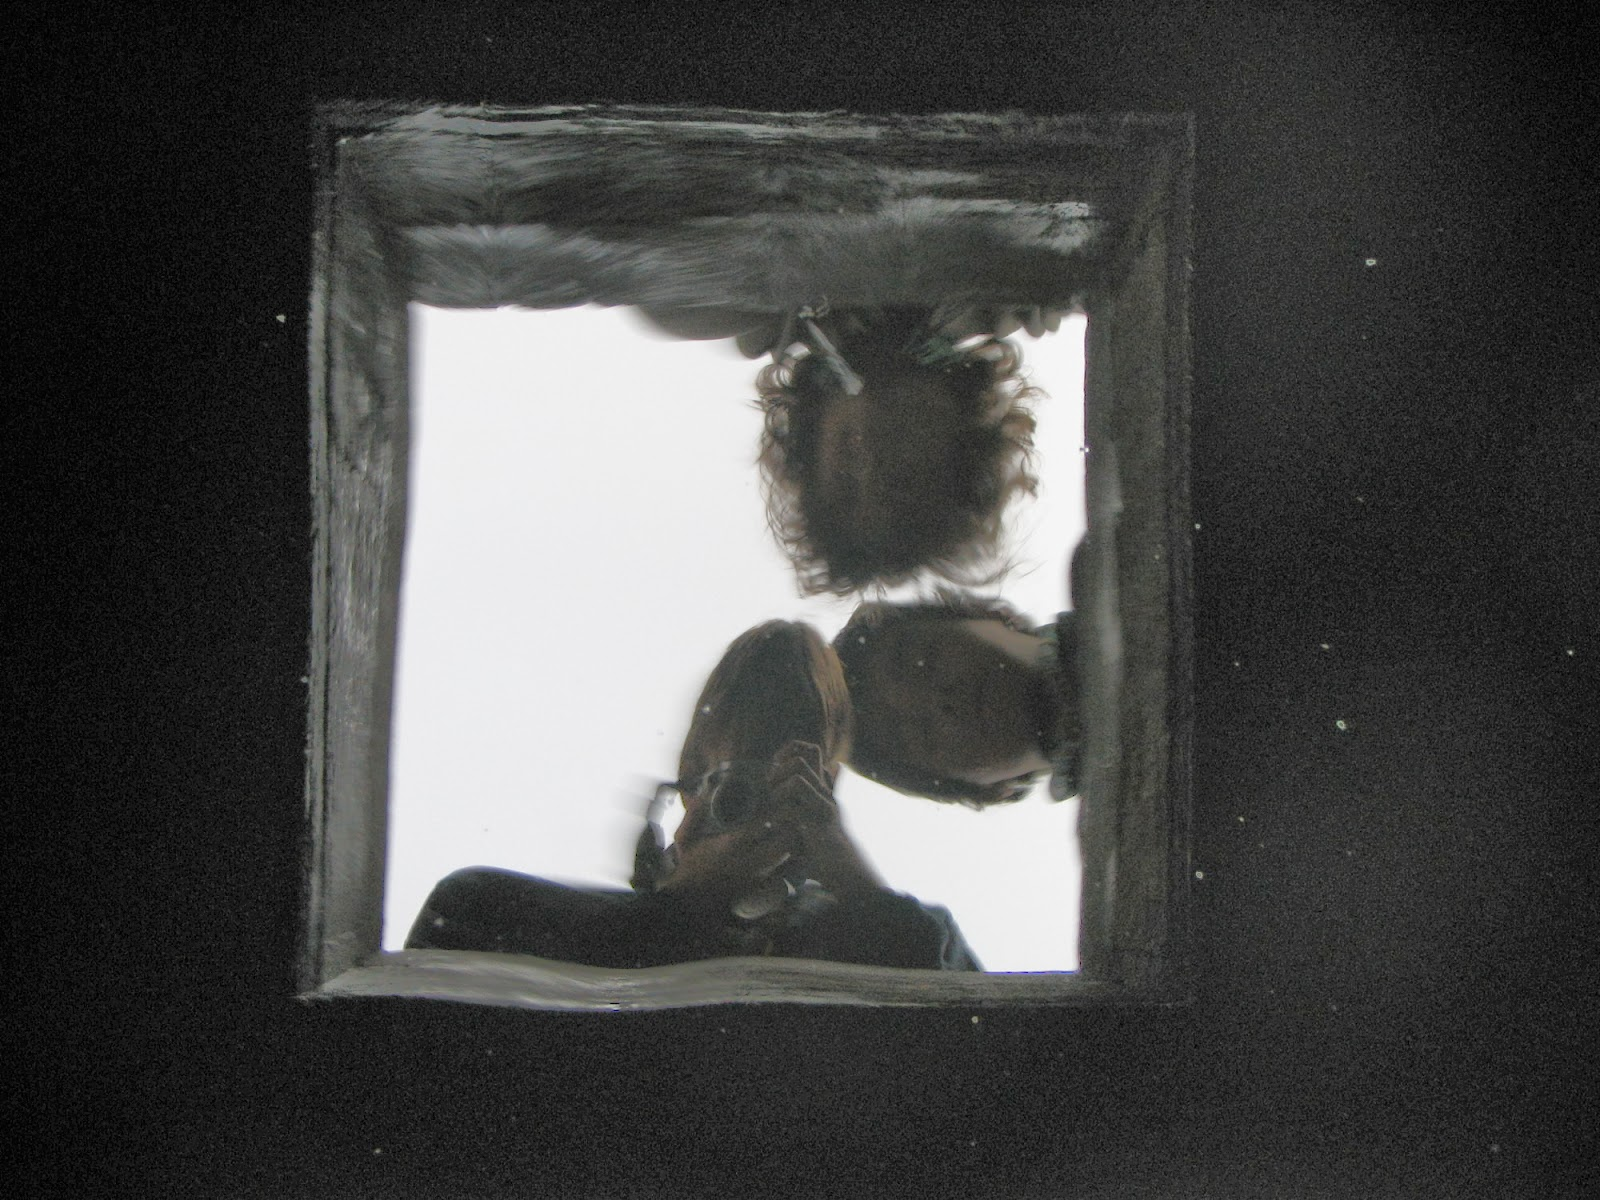 Vodov izlet, Ilirska Bistrica 2005 - Picture%2B303.jpg